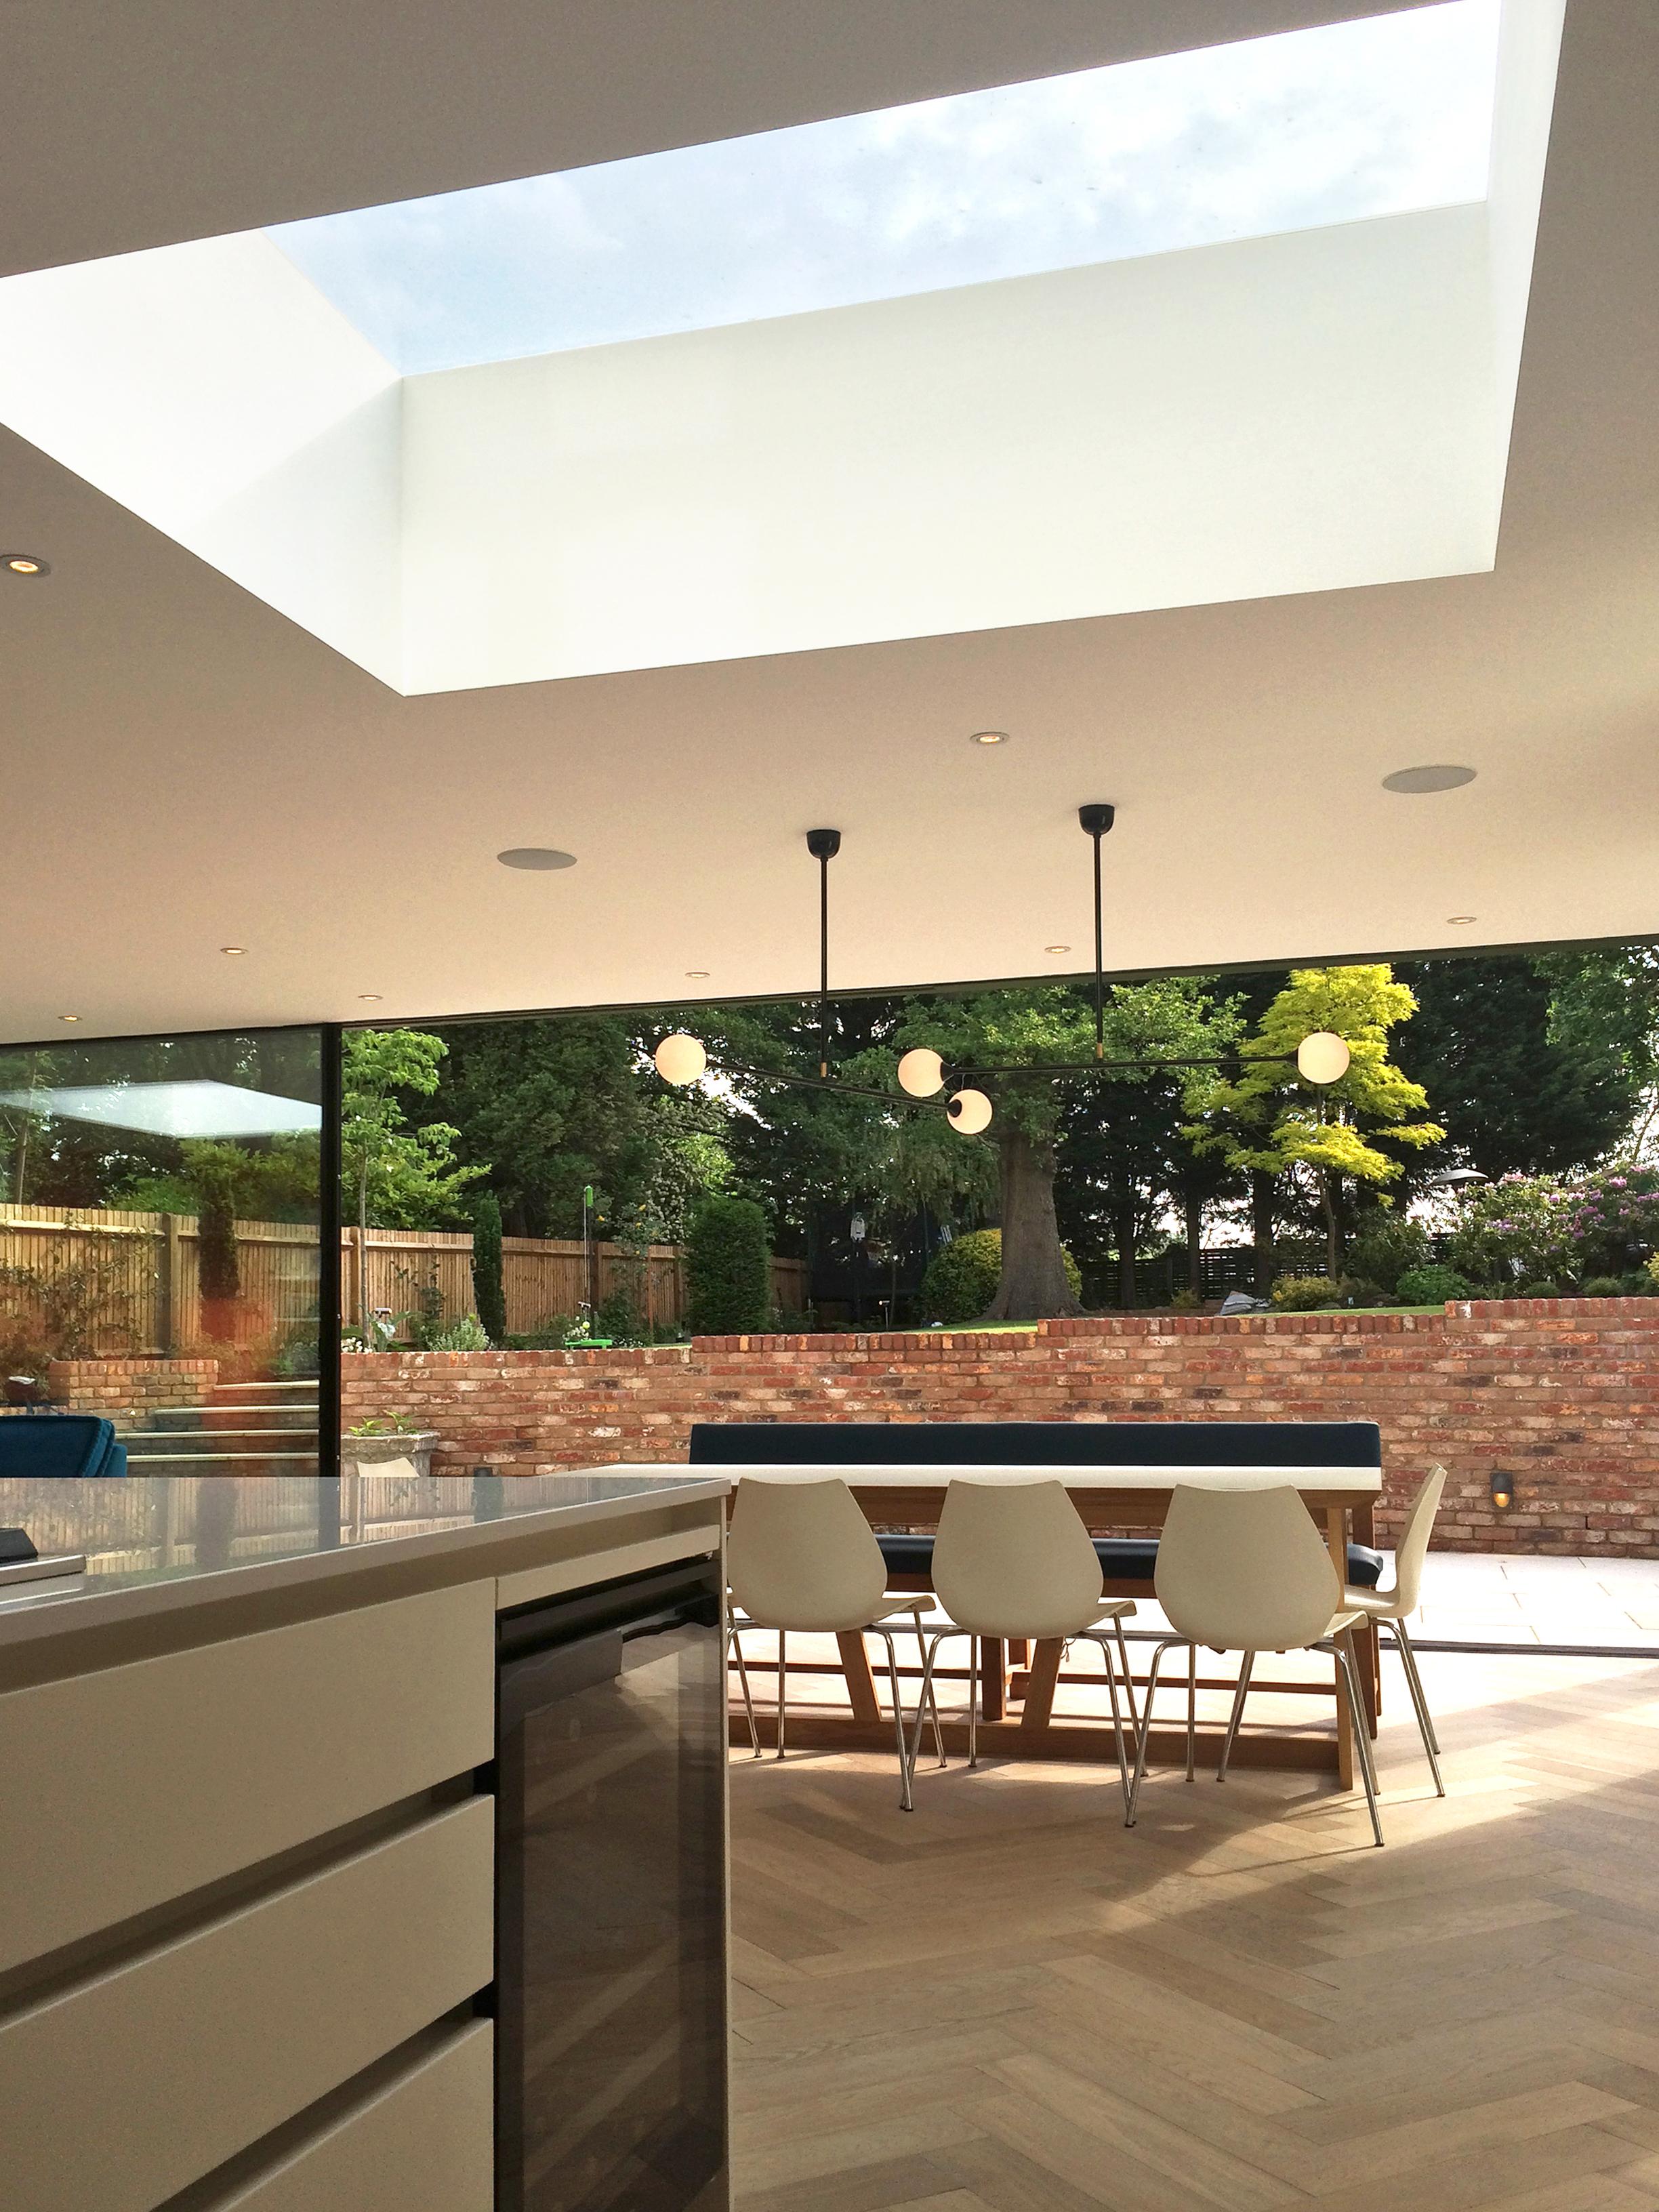 Finchley Refurbishment Roof Light